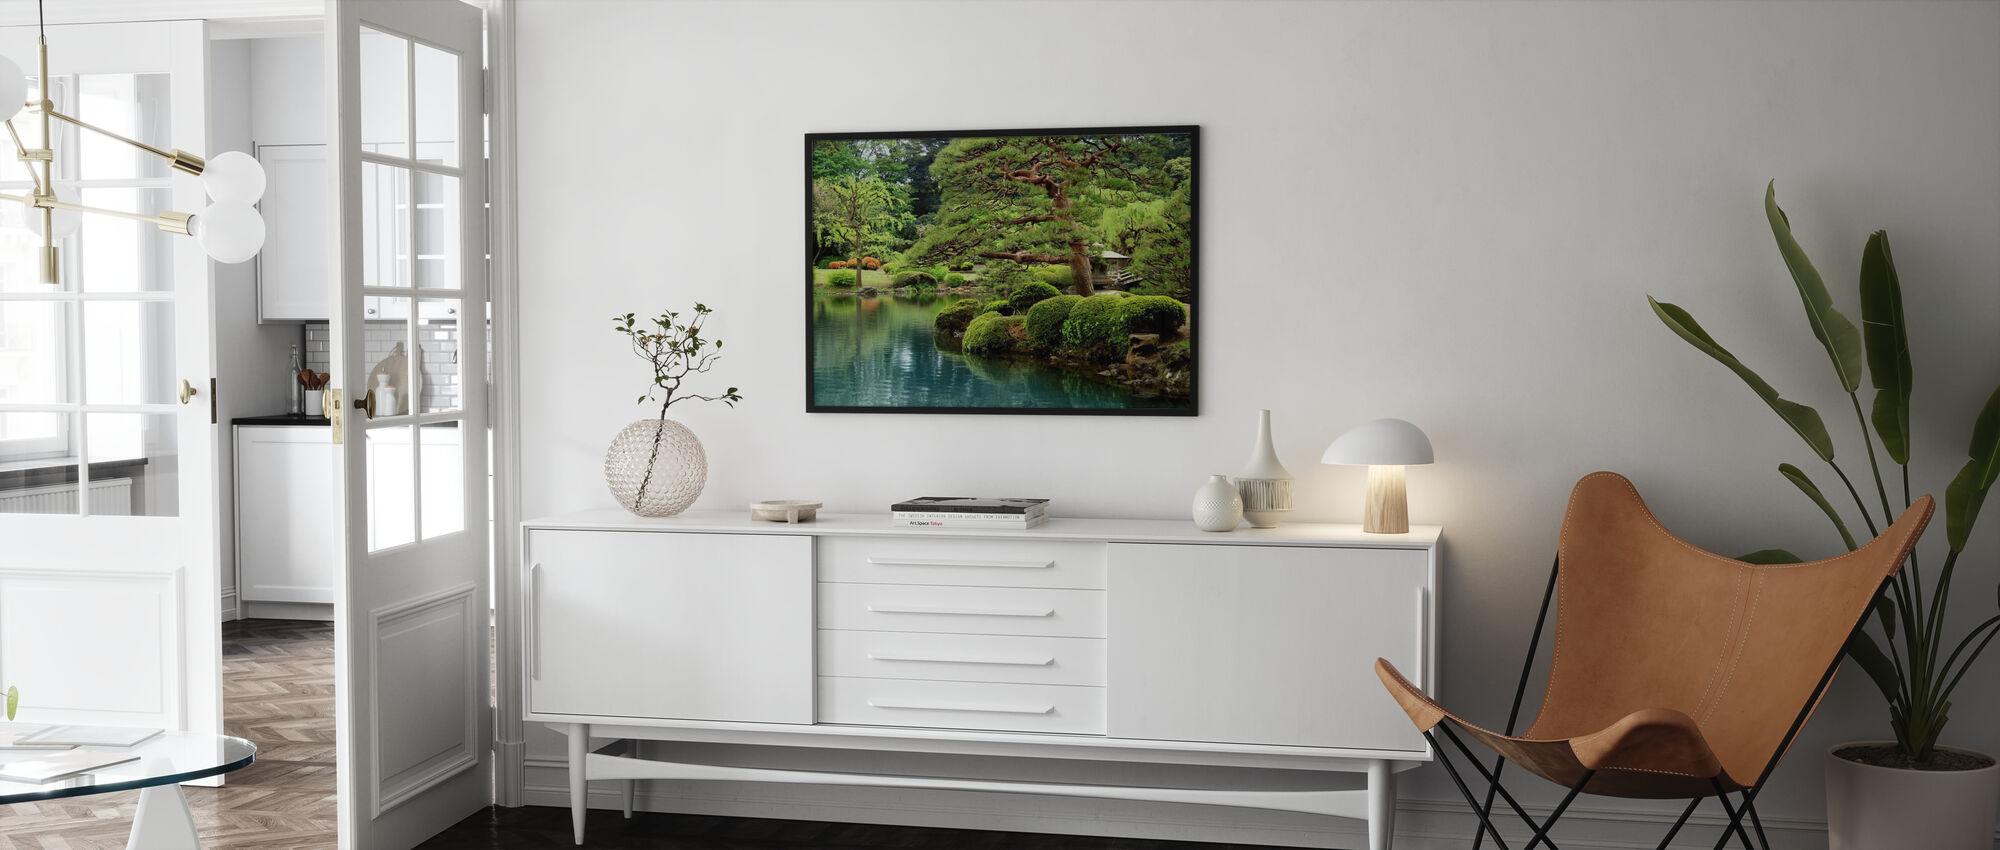 Calm Zen Lake and Bonsai Trees in Tokyo Garden - Poster - Living Room